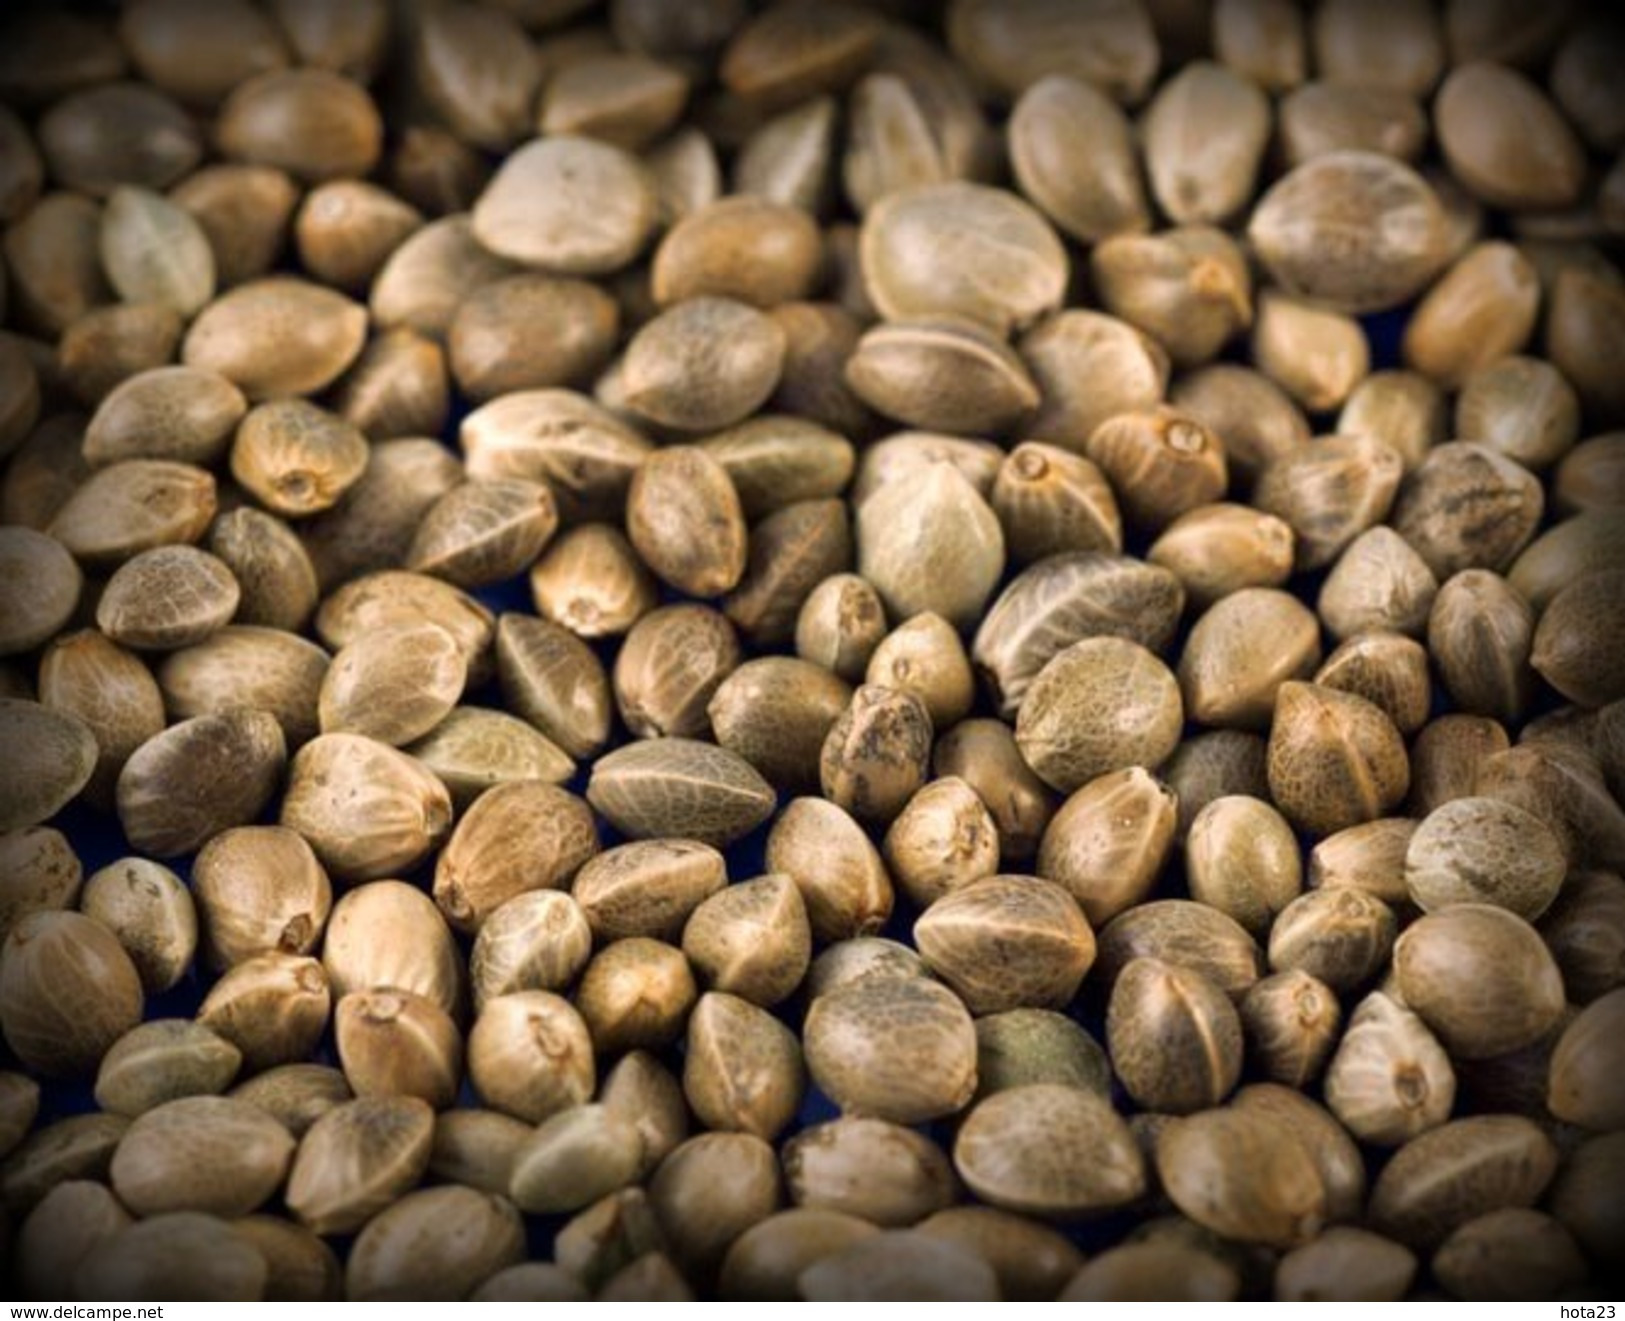 Hemp RAW CANNABIS SEEDS 25g Garden Growing WHOLE NUTRITIUS BIRD FOOD New Harvest - 2. Graines